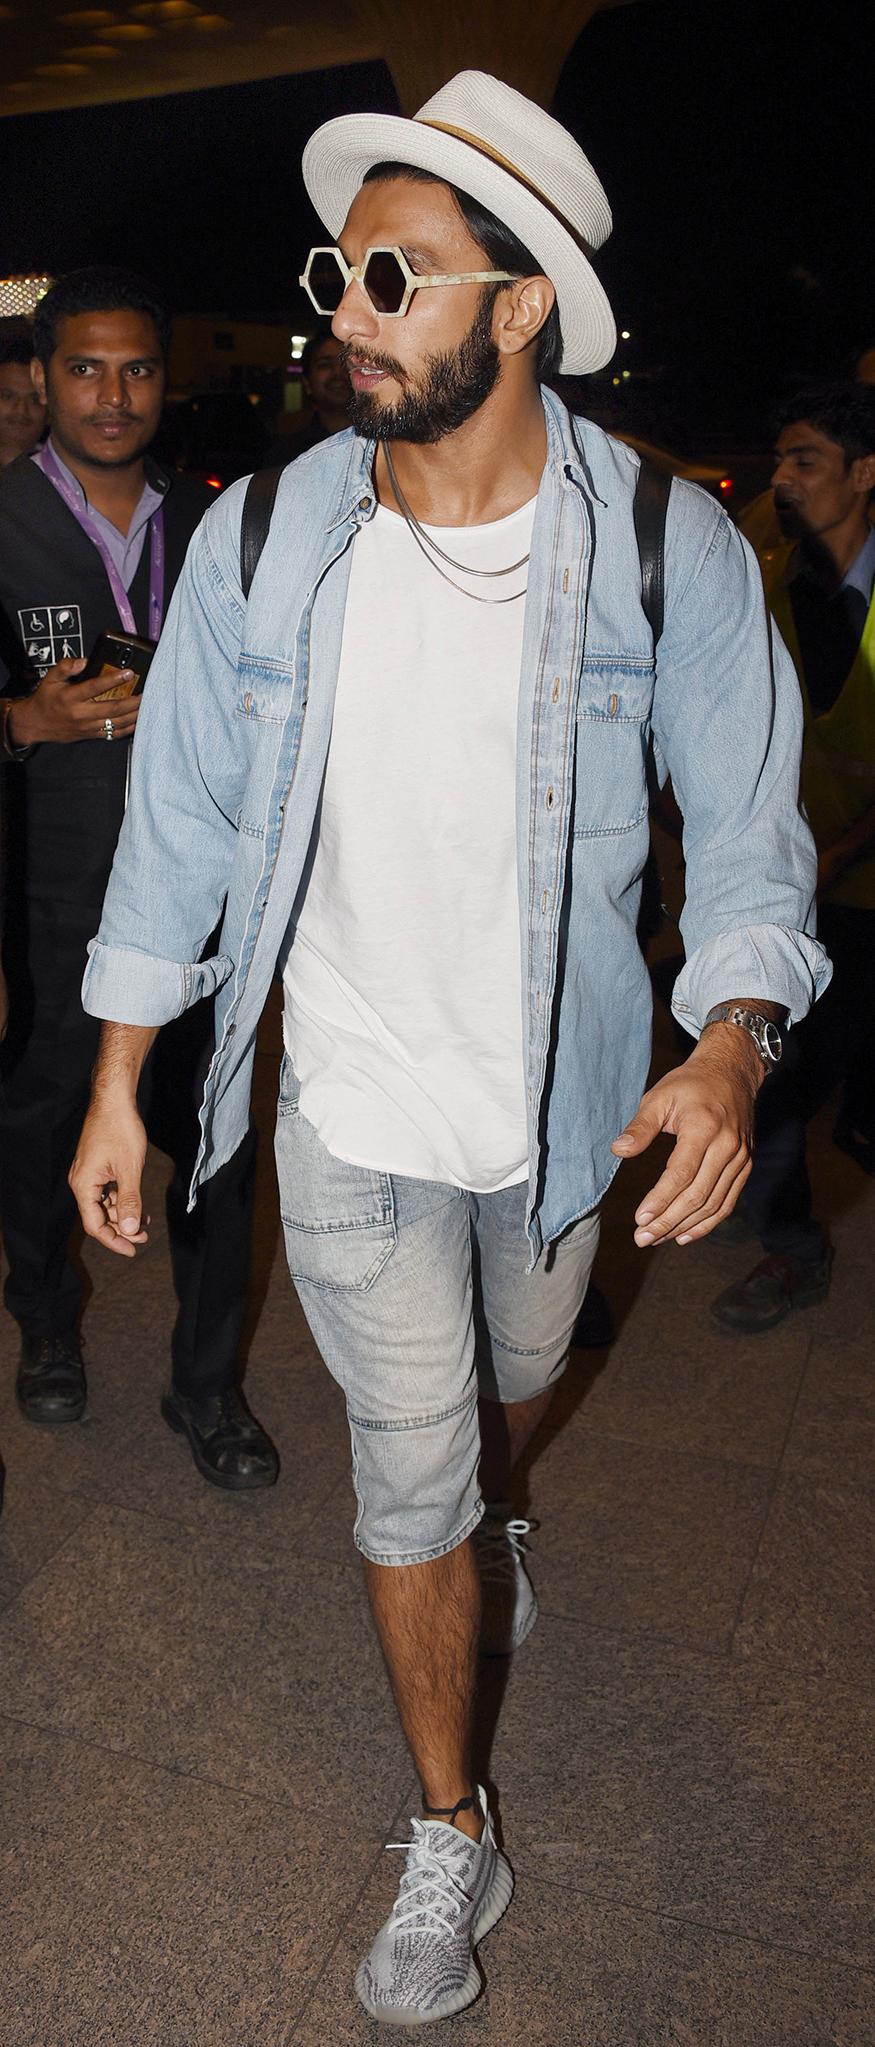 Ranveer Singh snapped at Mumbai airport while leaving for Sri Lanka. (Image: Yogen Shah)